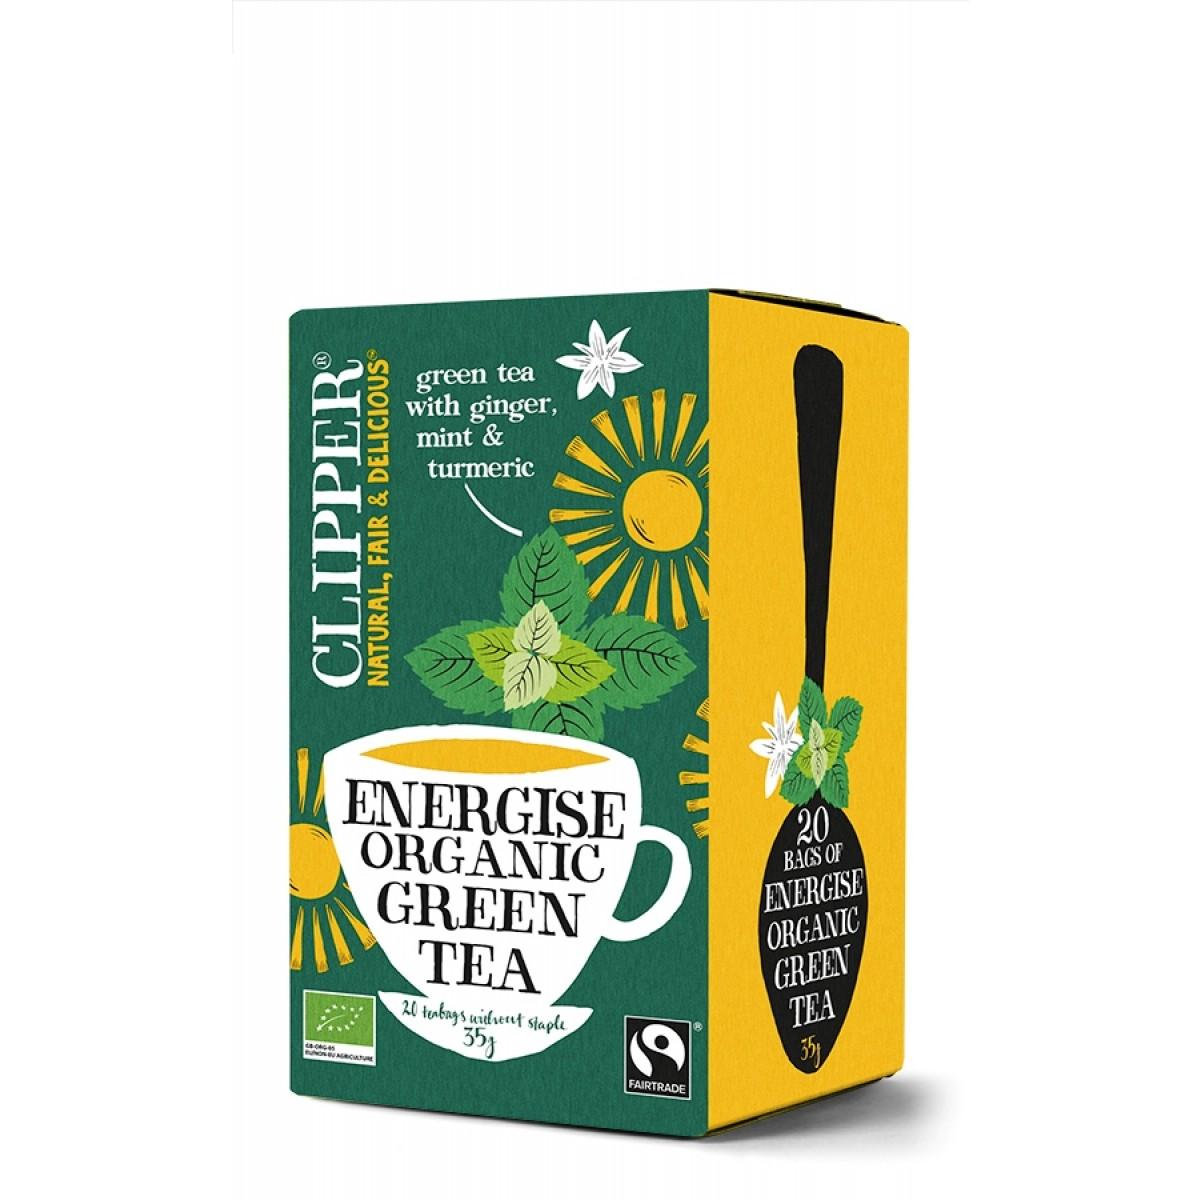 Energise Green Tea